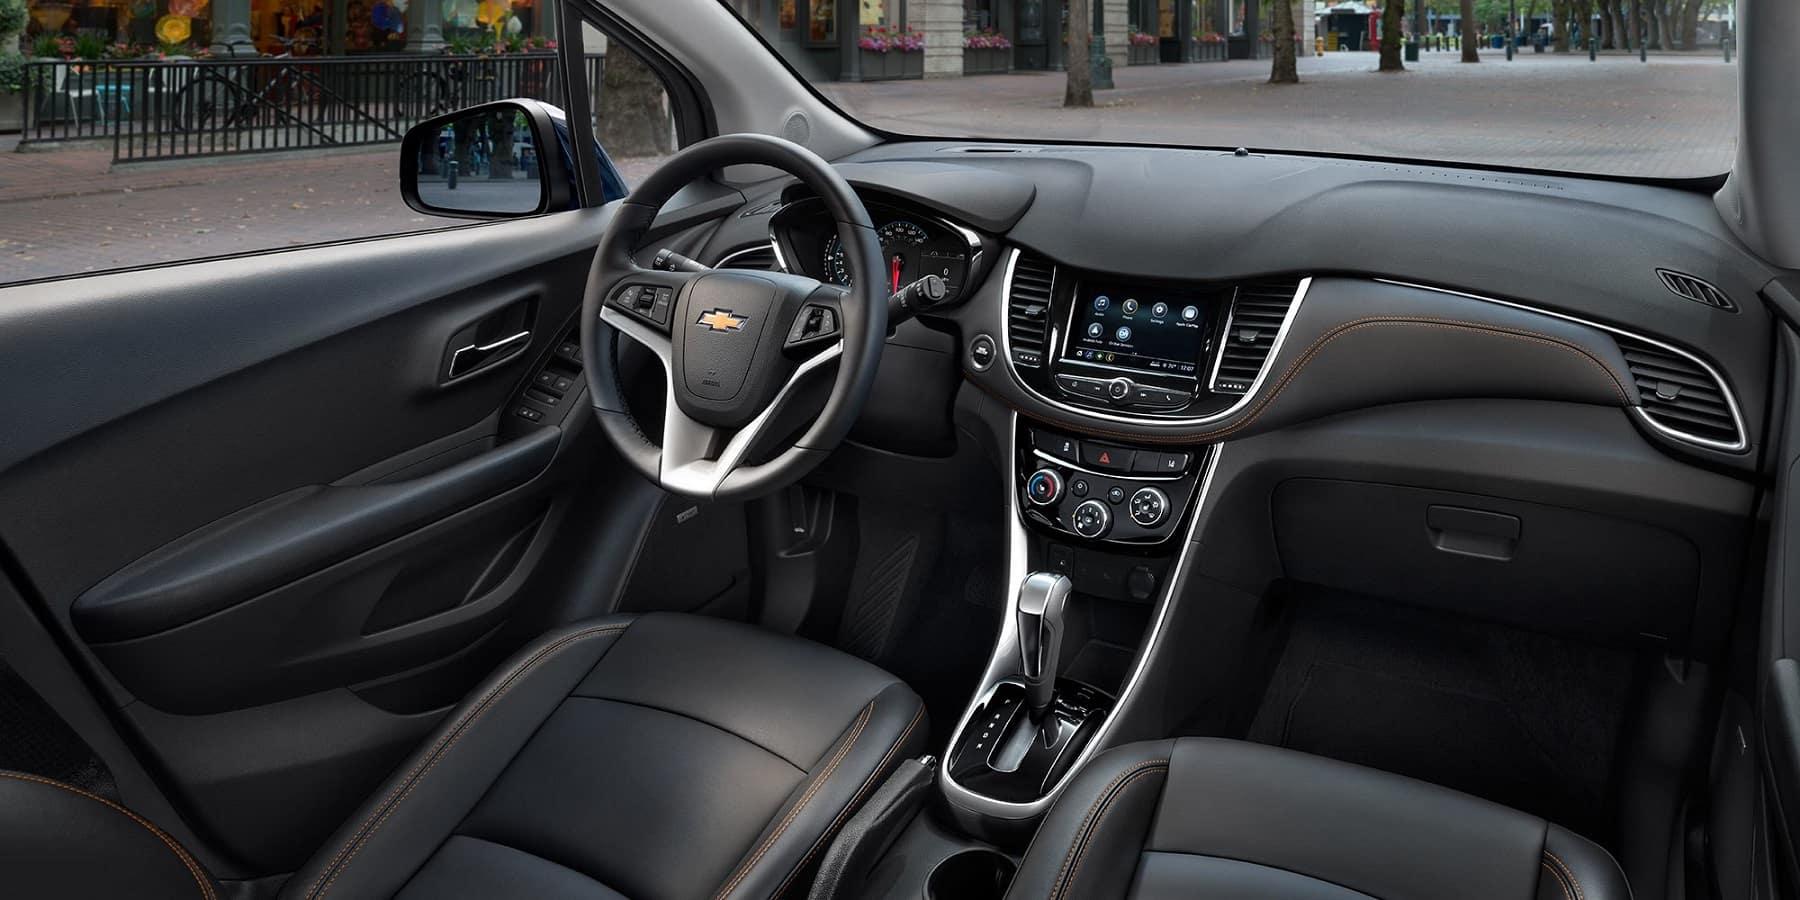 New 2018 Chevy Trax Interior